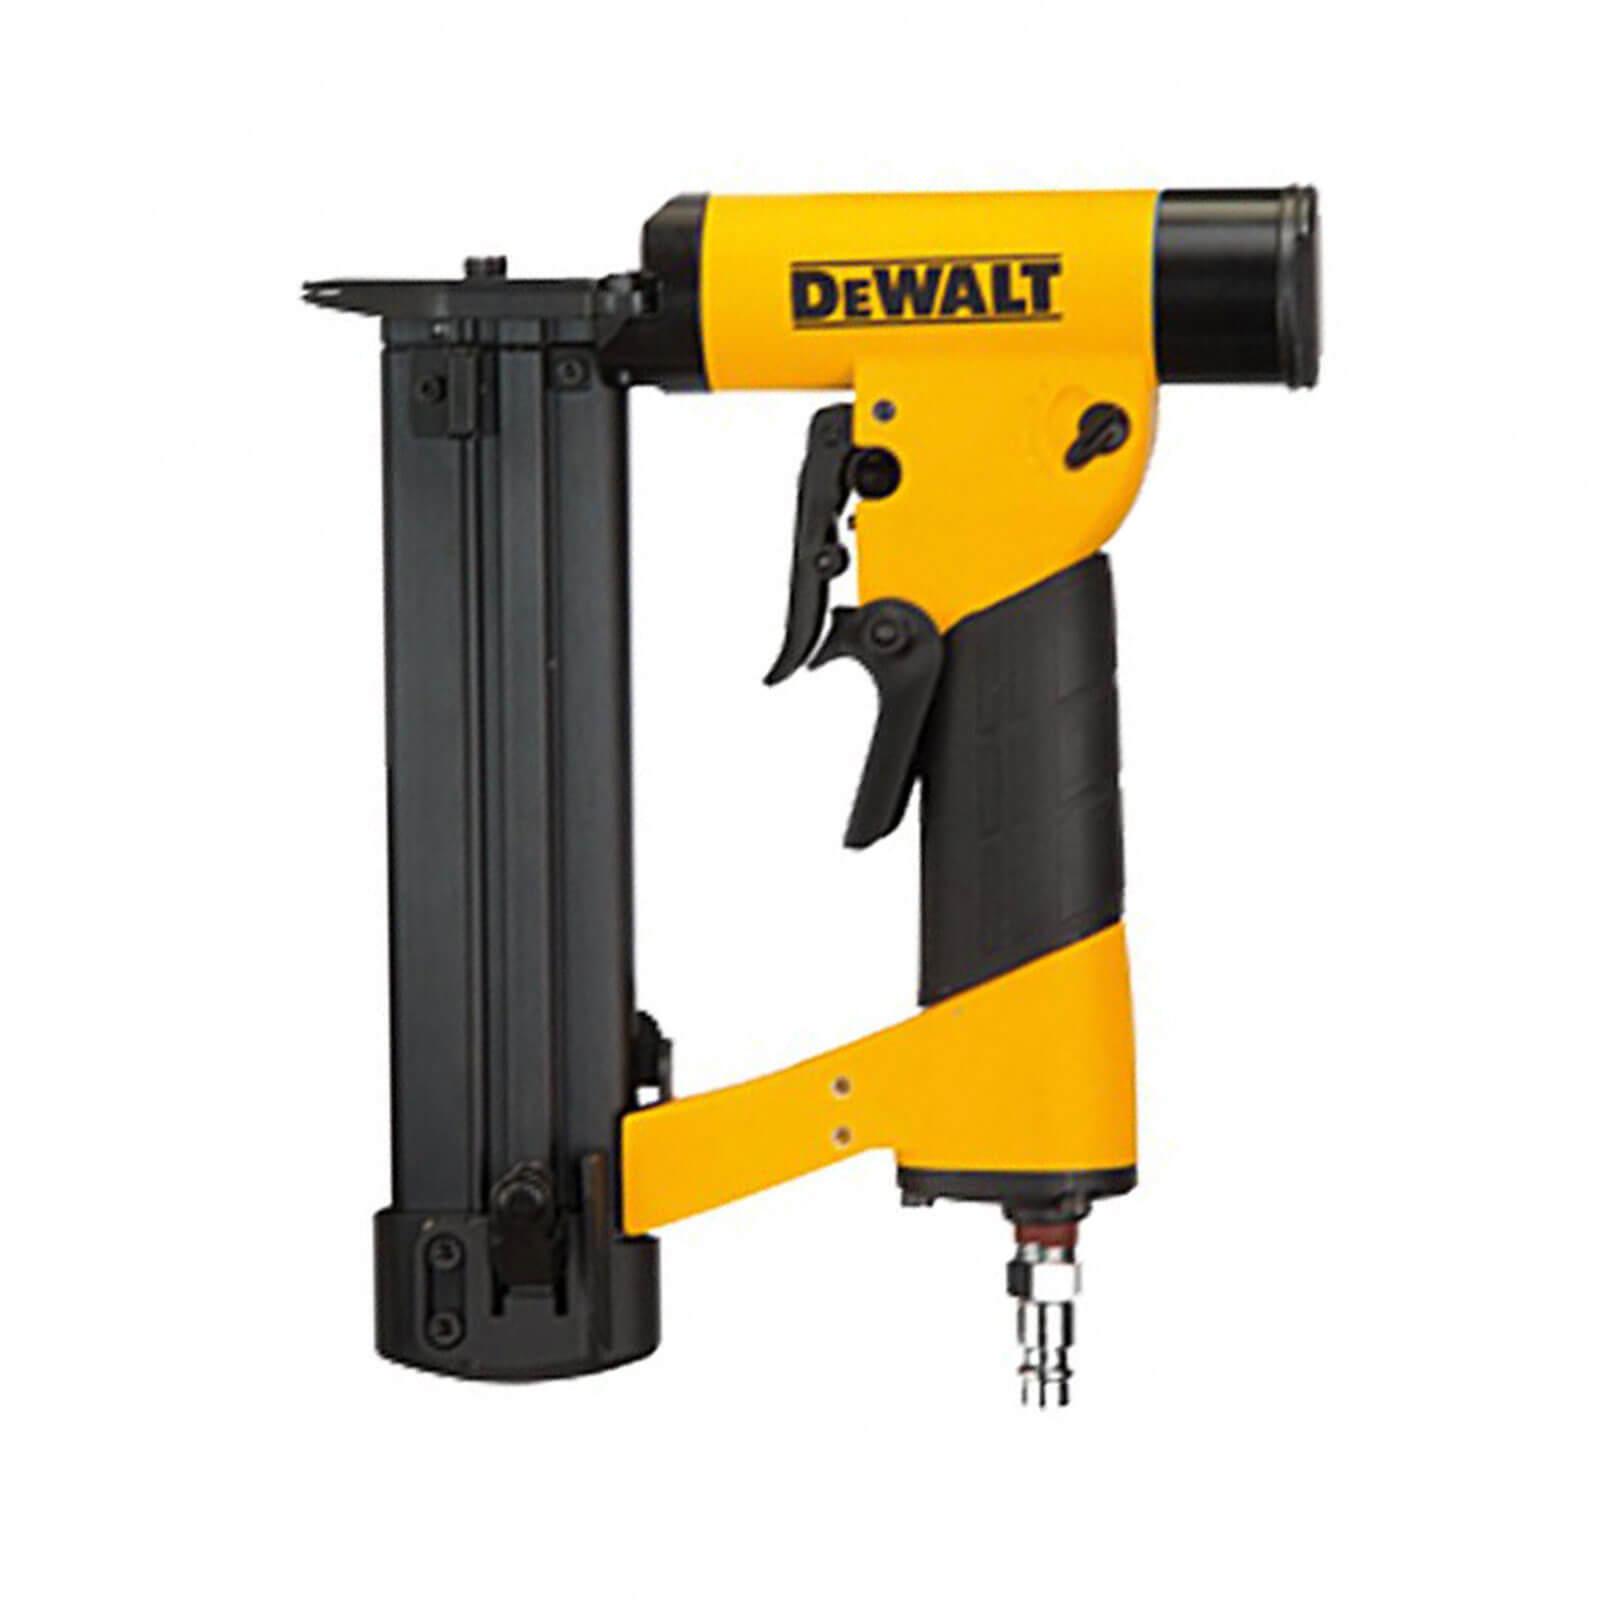 Image of DeWalt DPN2330 23 Gauge Headless Pinner Air Nail Gun